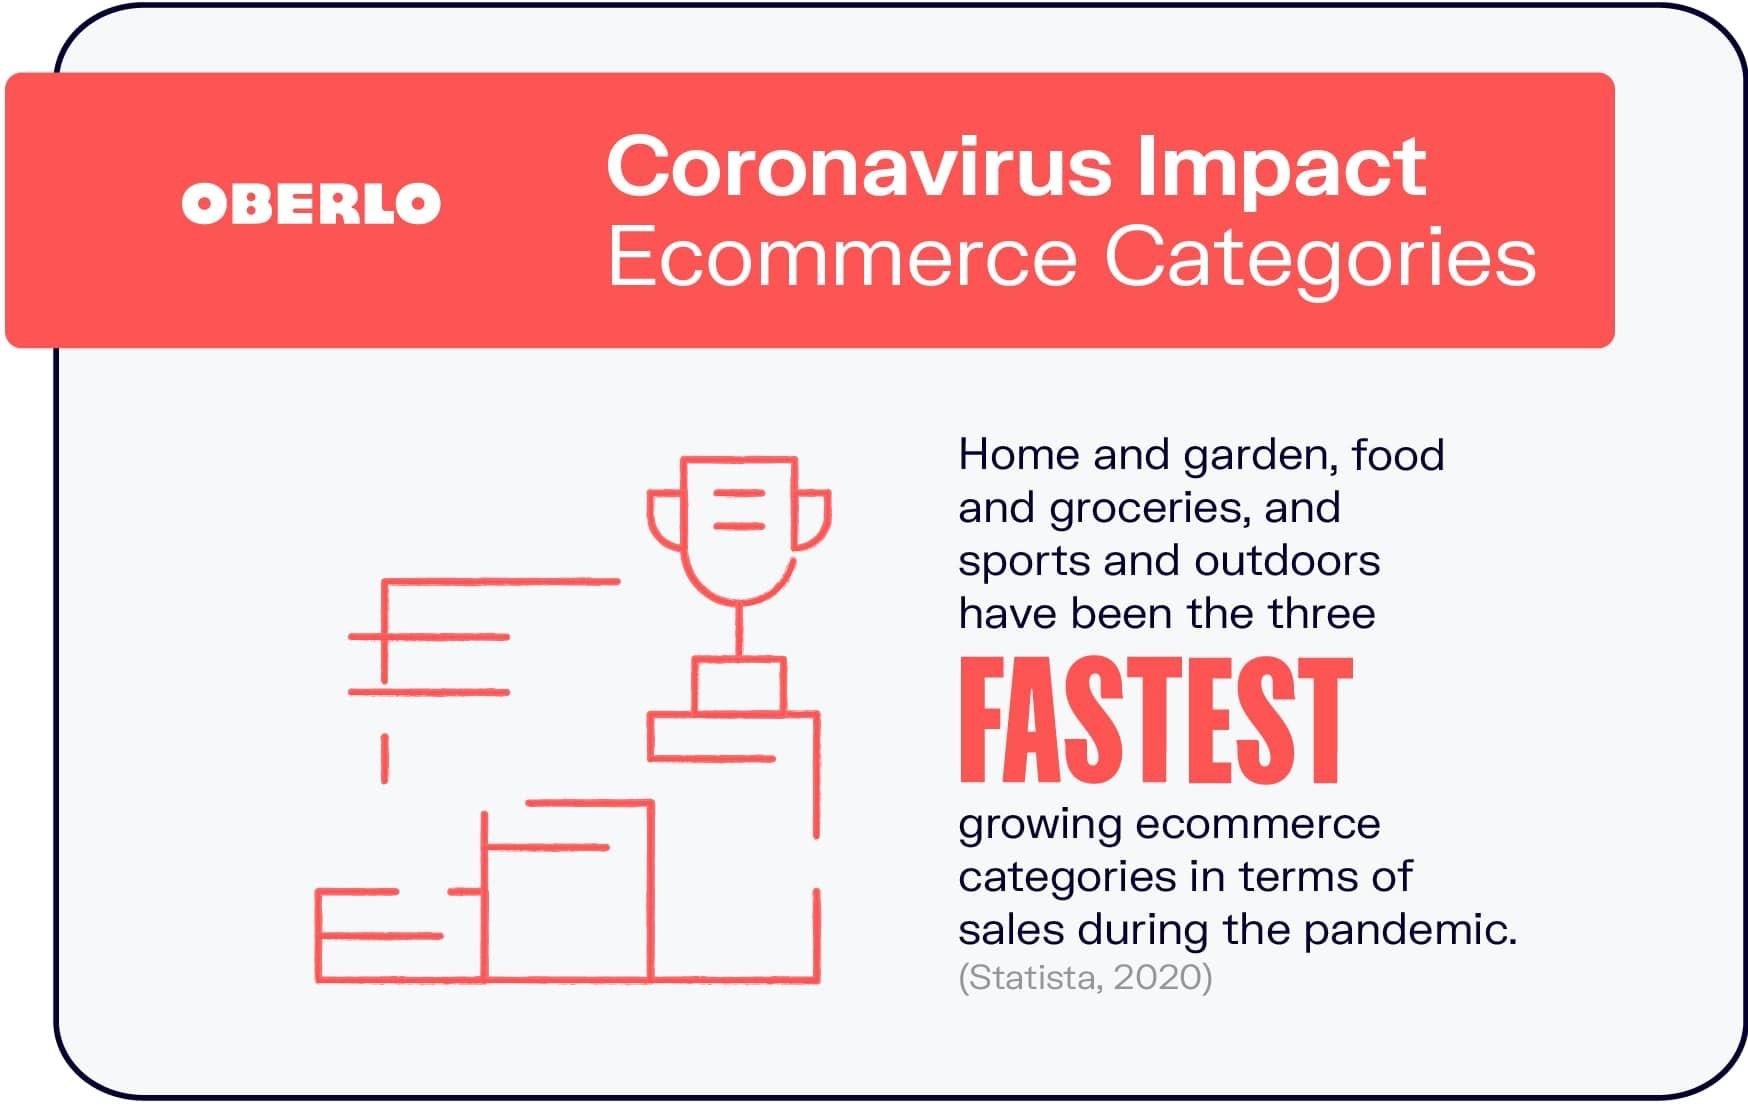 Coronavirus Impact on Ecommerce Categories